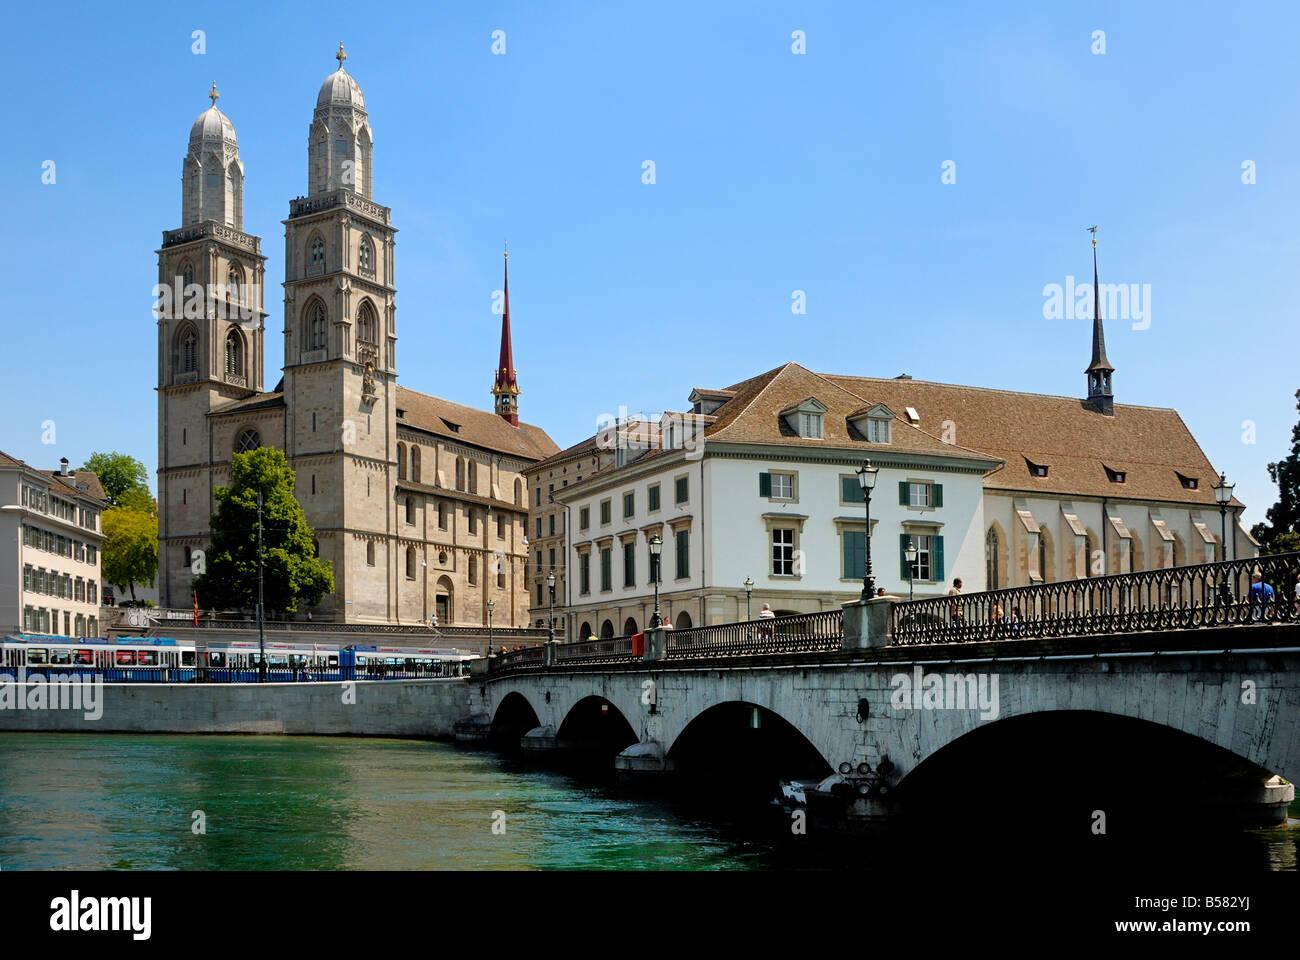 Grossmunster church and Munster bridge over the River Limmat, Zurich, Switzerland, Europe - Stock Image